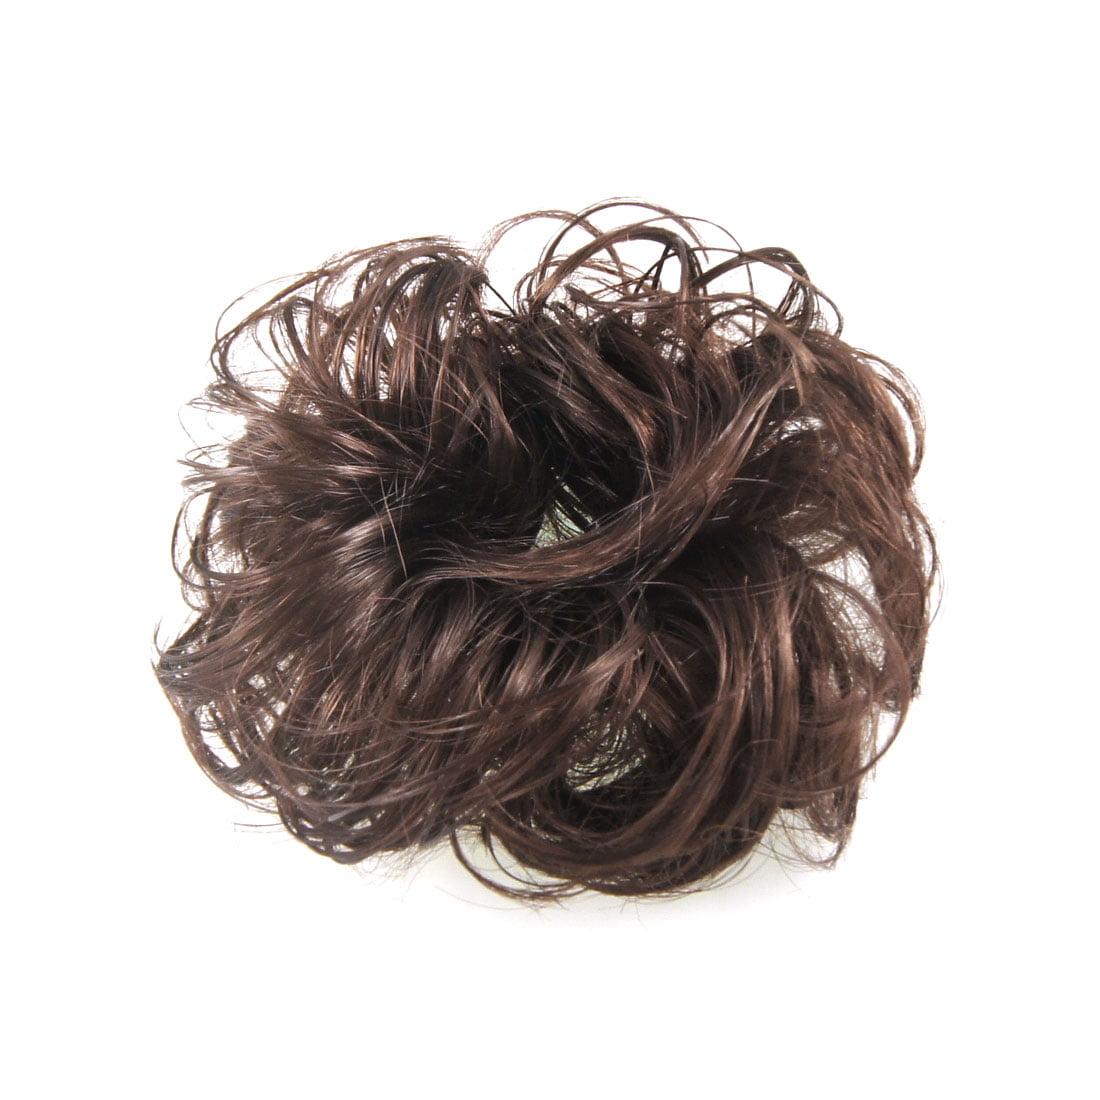 unique bargains light brown faux hair wedding elastic band curly